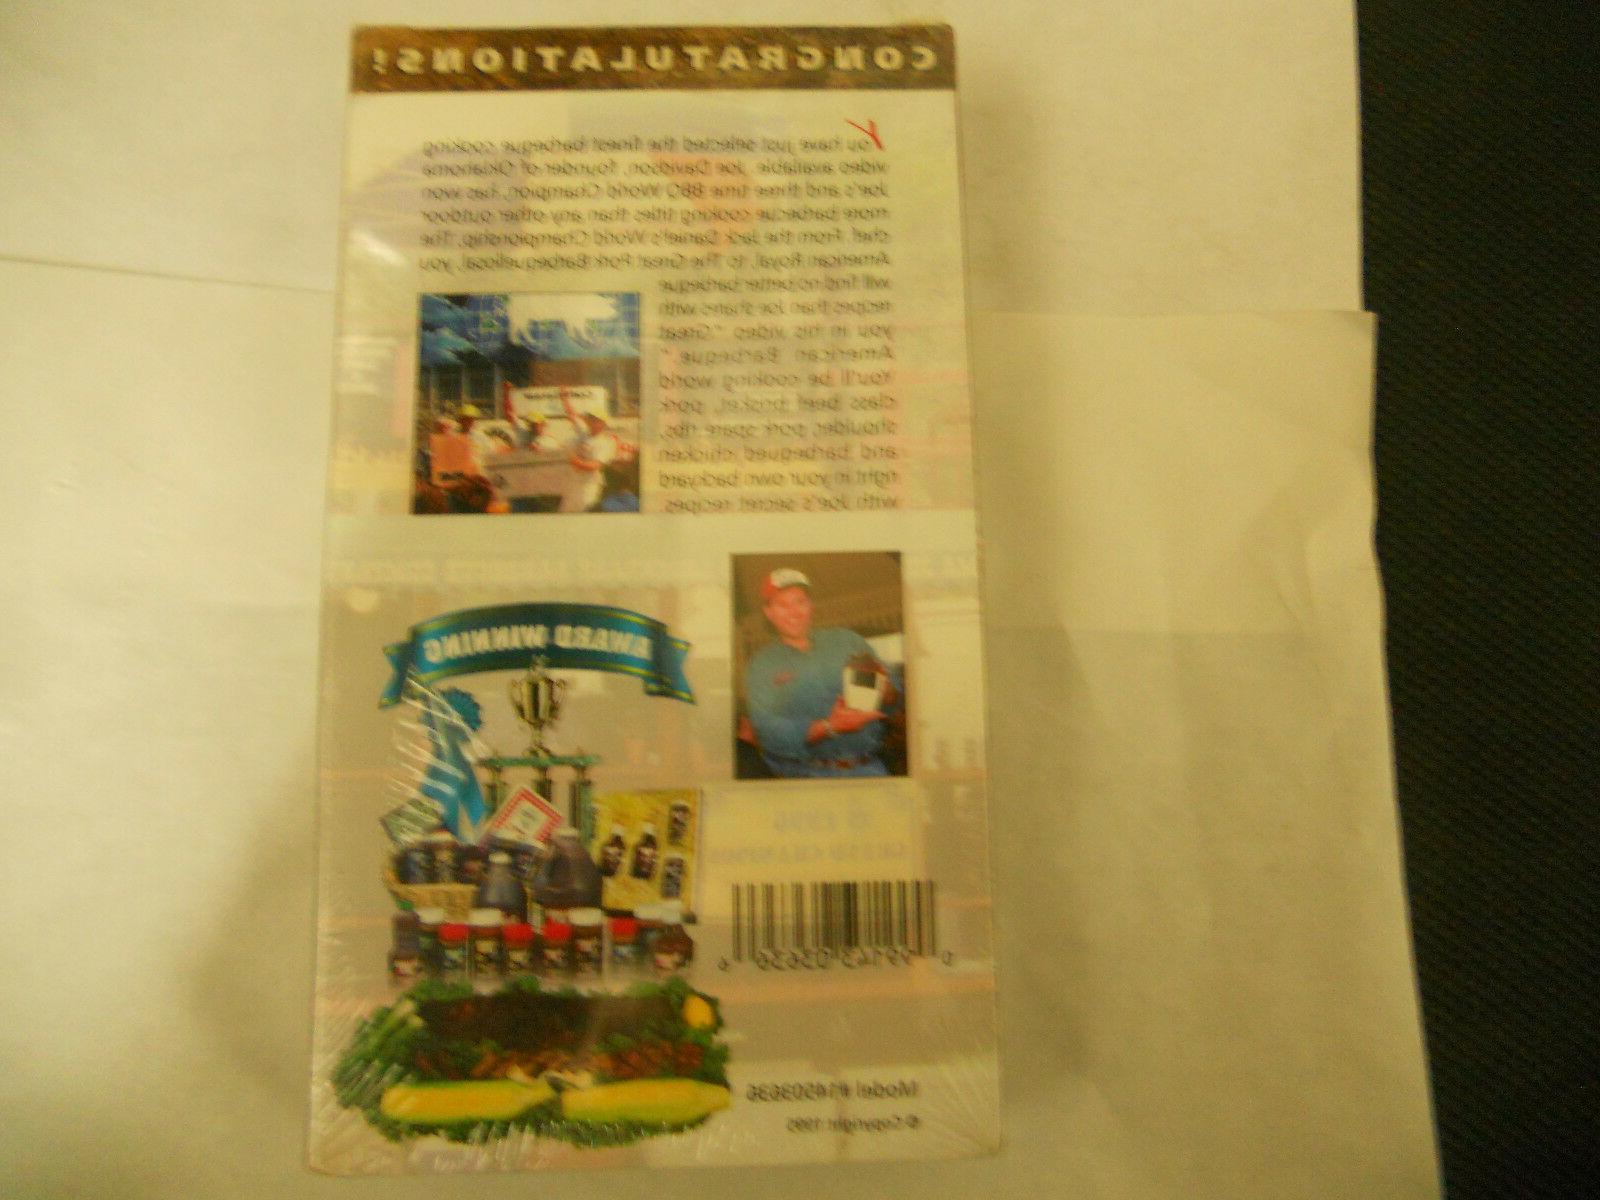 Oklahoma Joe's Great American Barbeque  NEW VHS